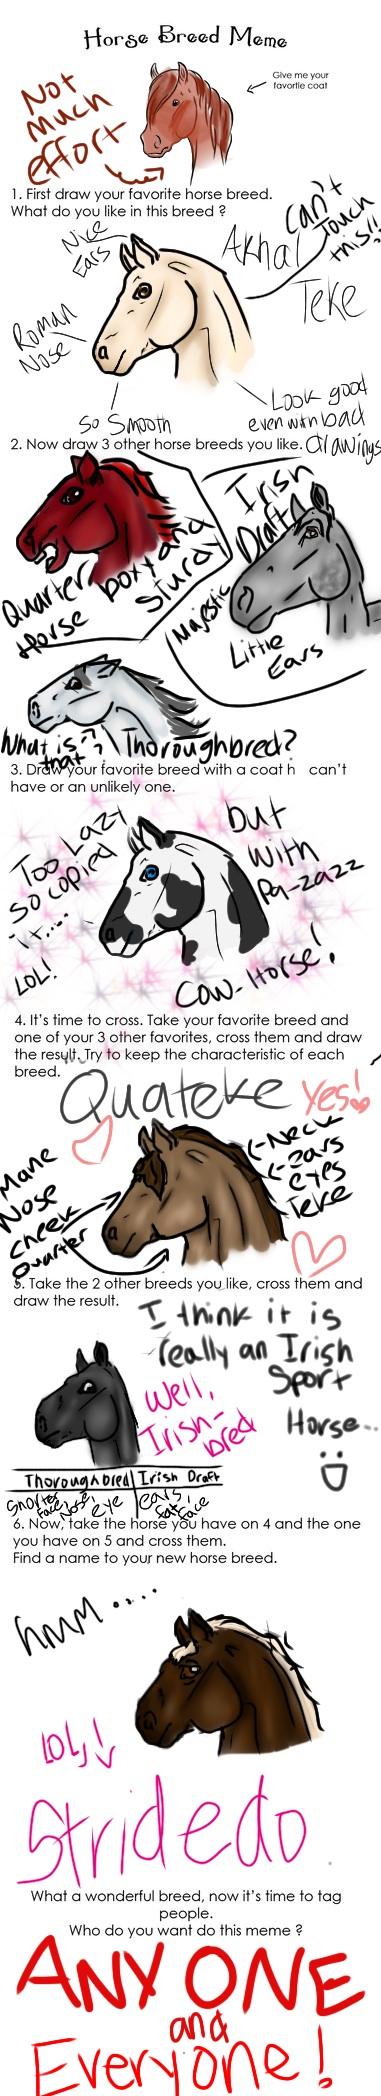 Horse meme by popmaster101